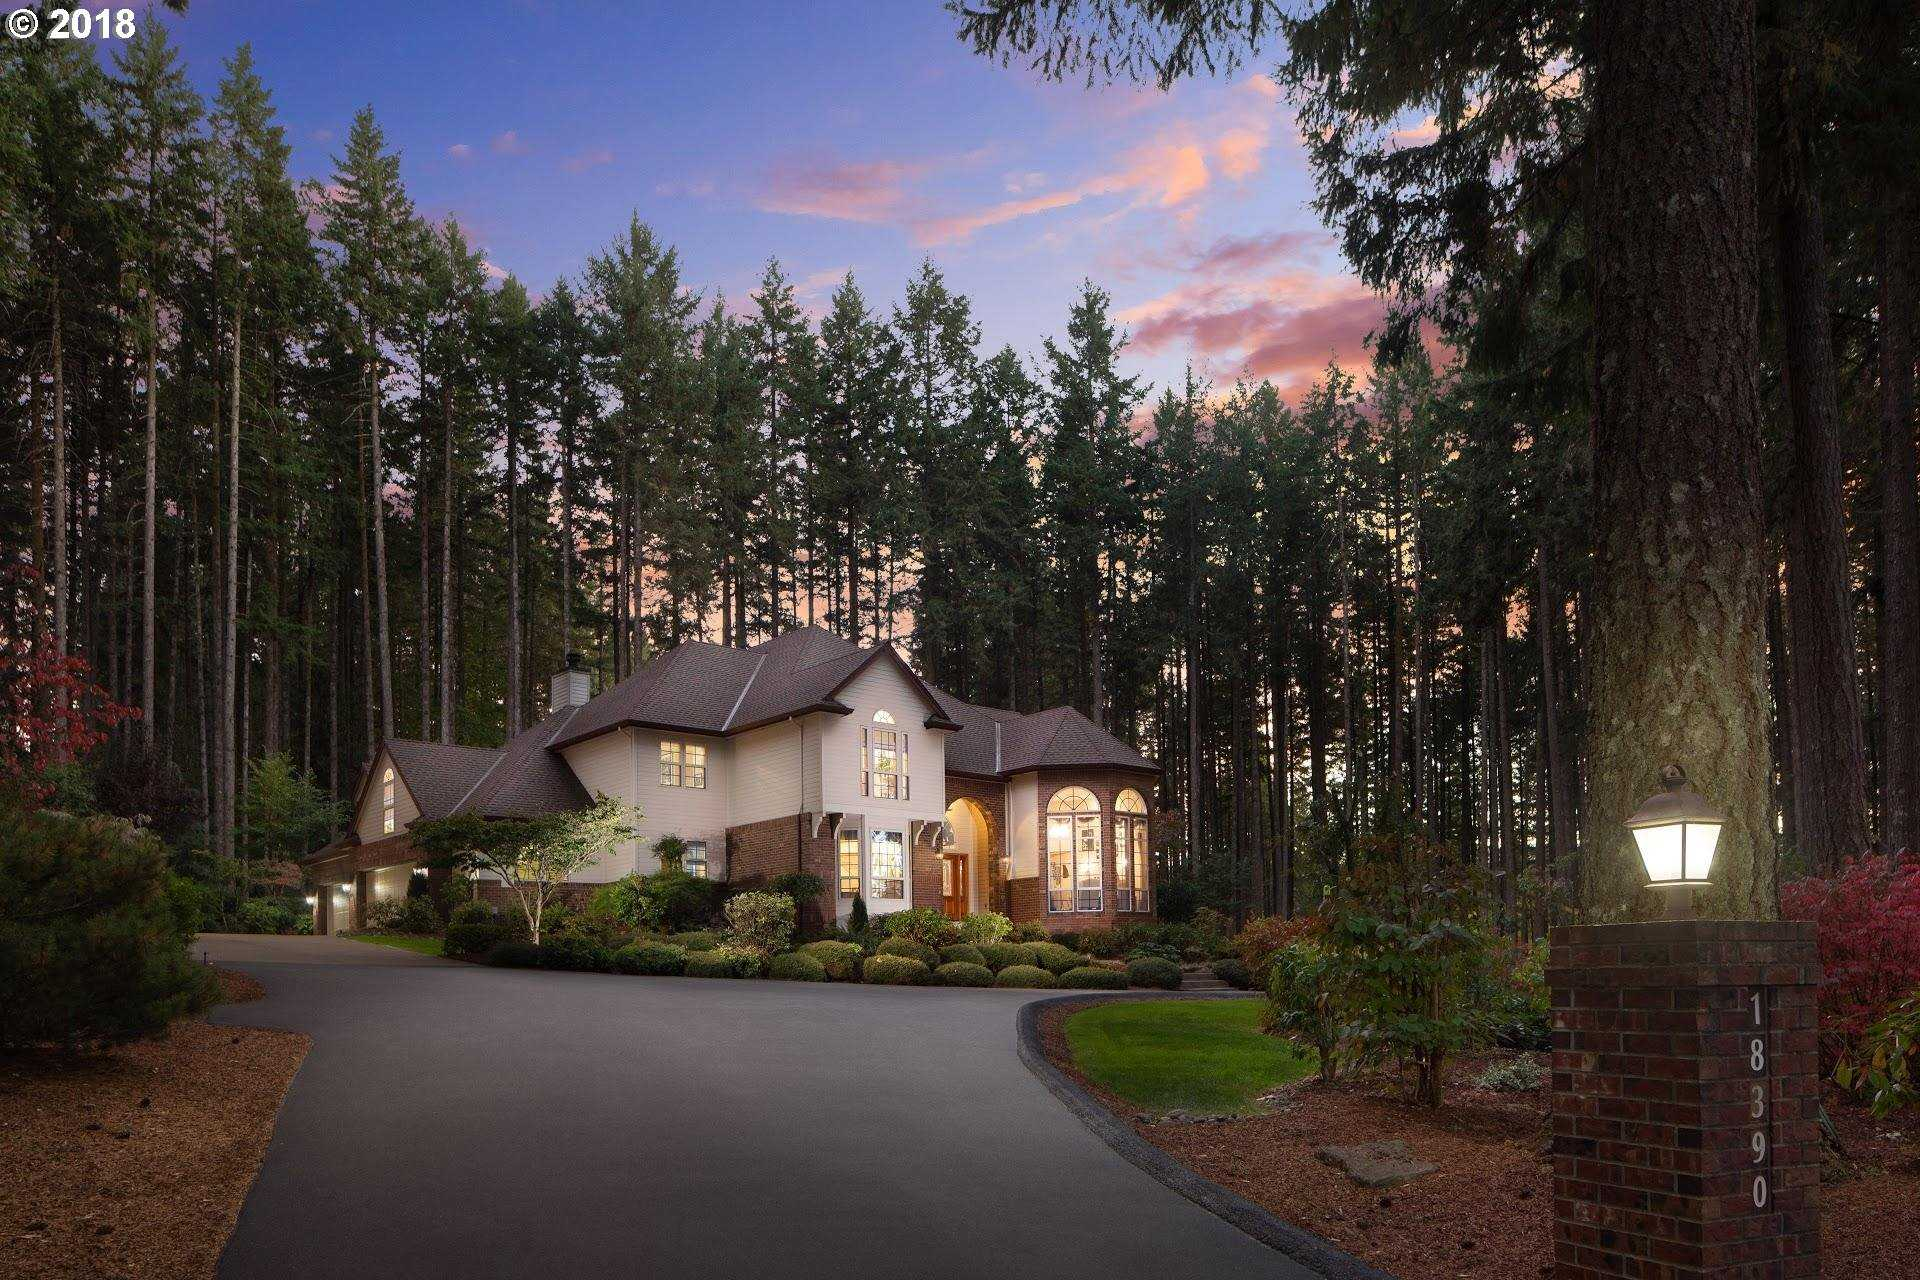 $1,192,000 - 5Br/4Ba -  for Sale in Rural, Hillsboro